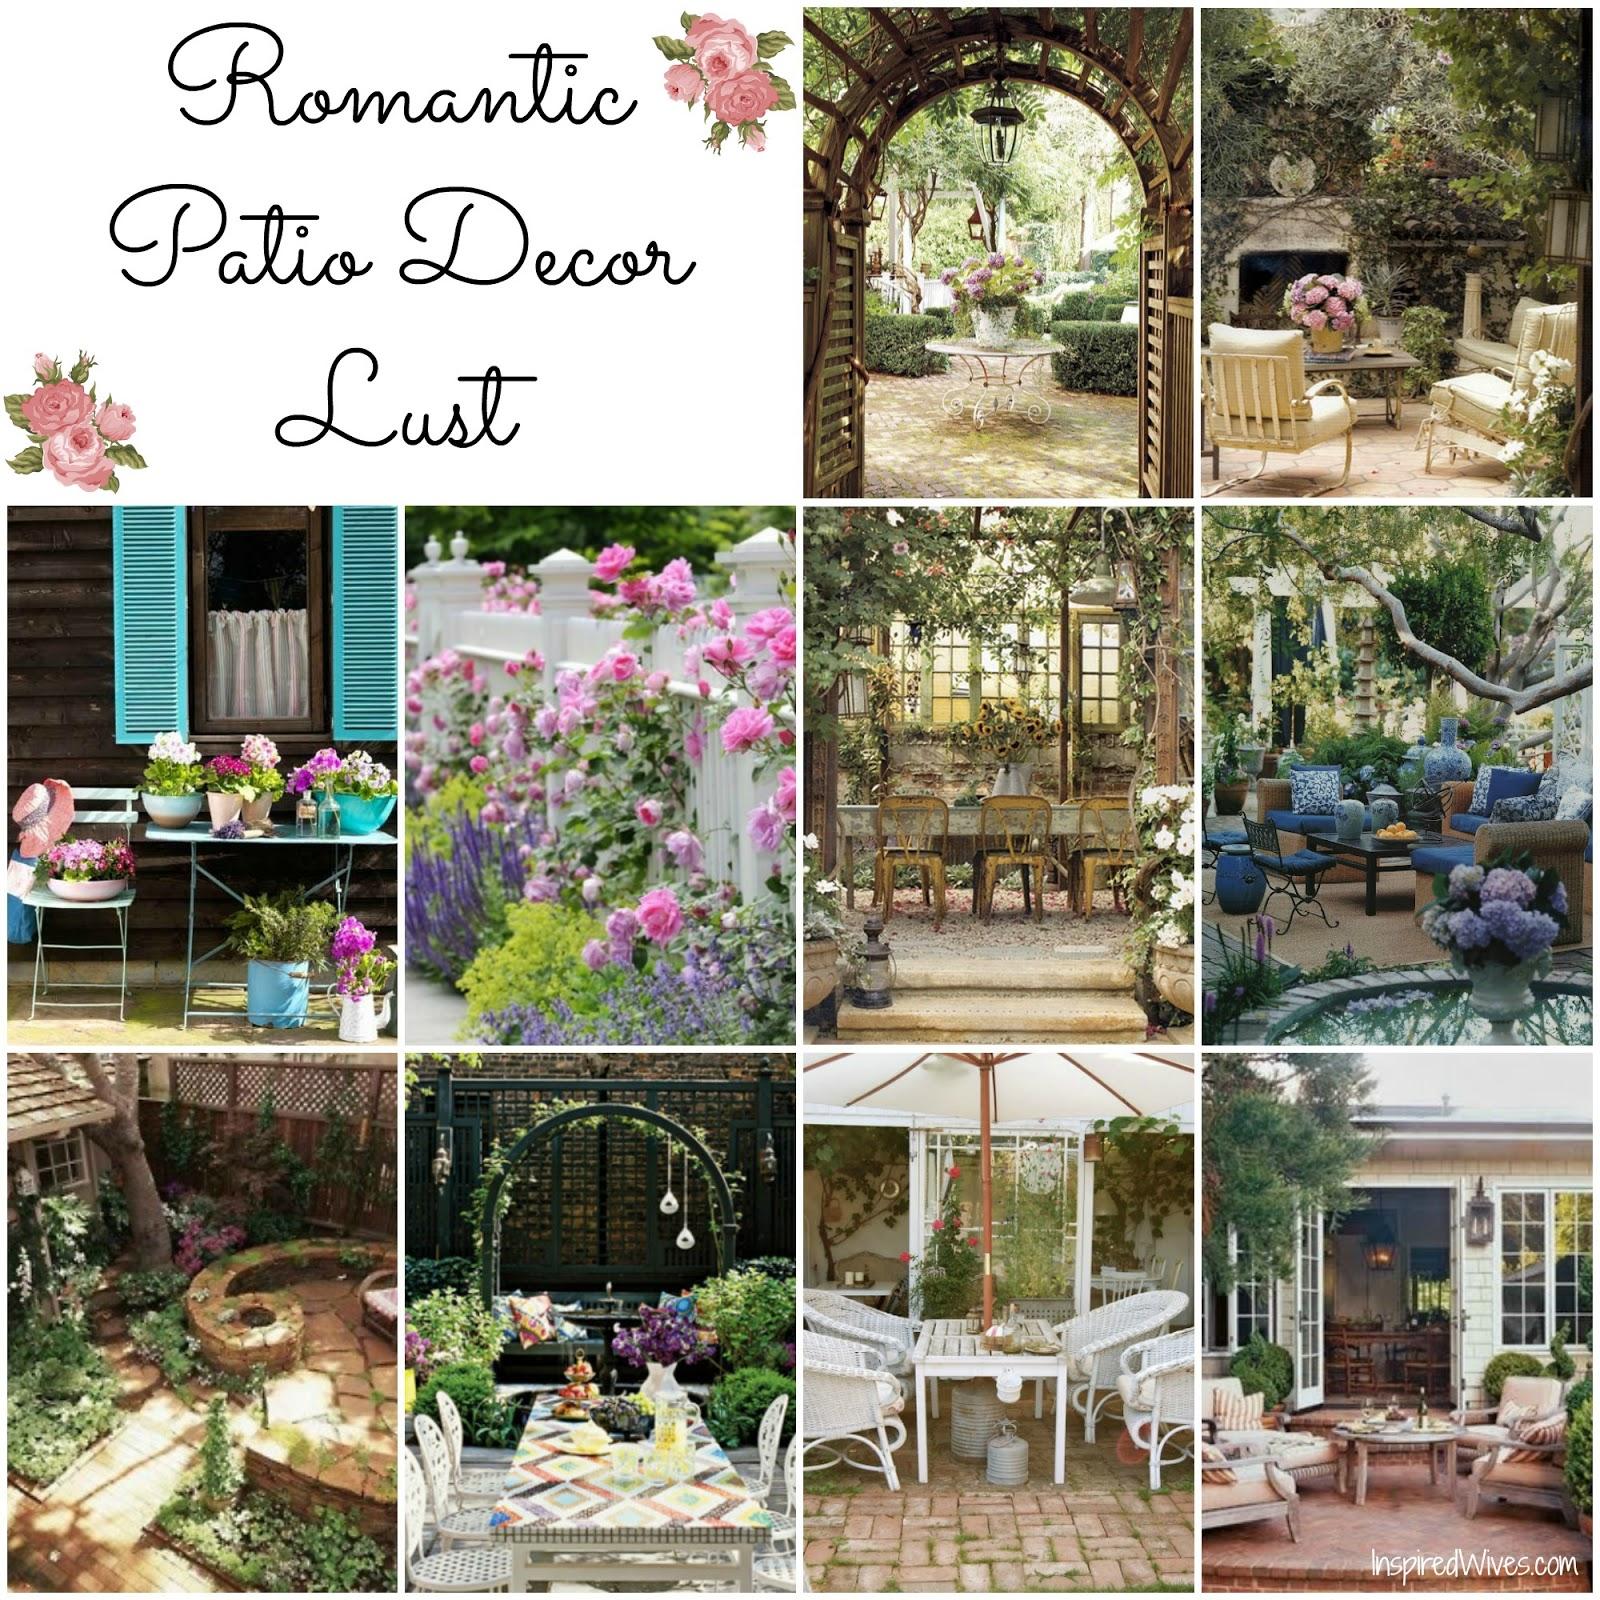 Patio decorating ideas cheap for Romantic patio ideas